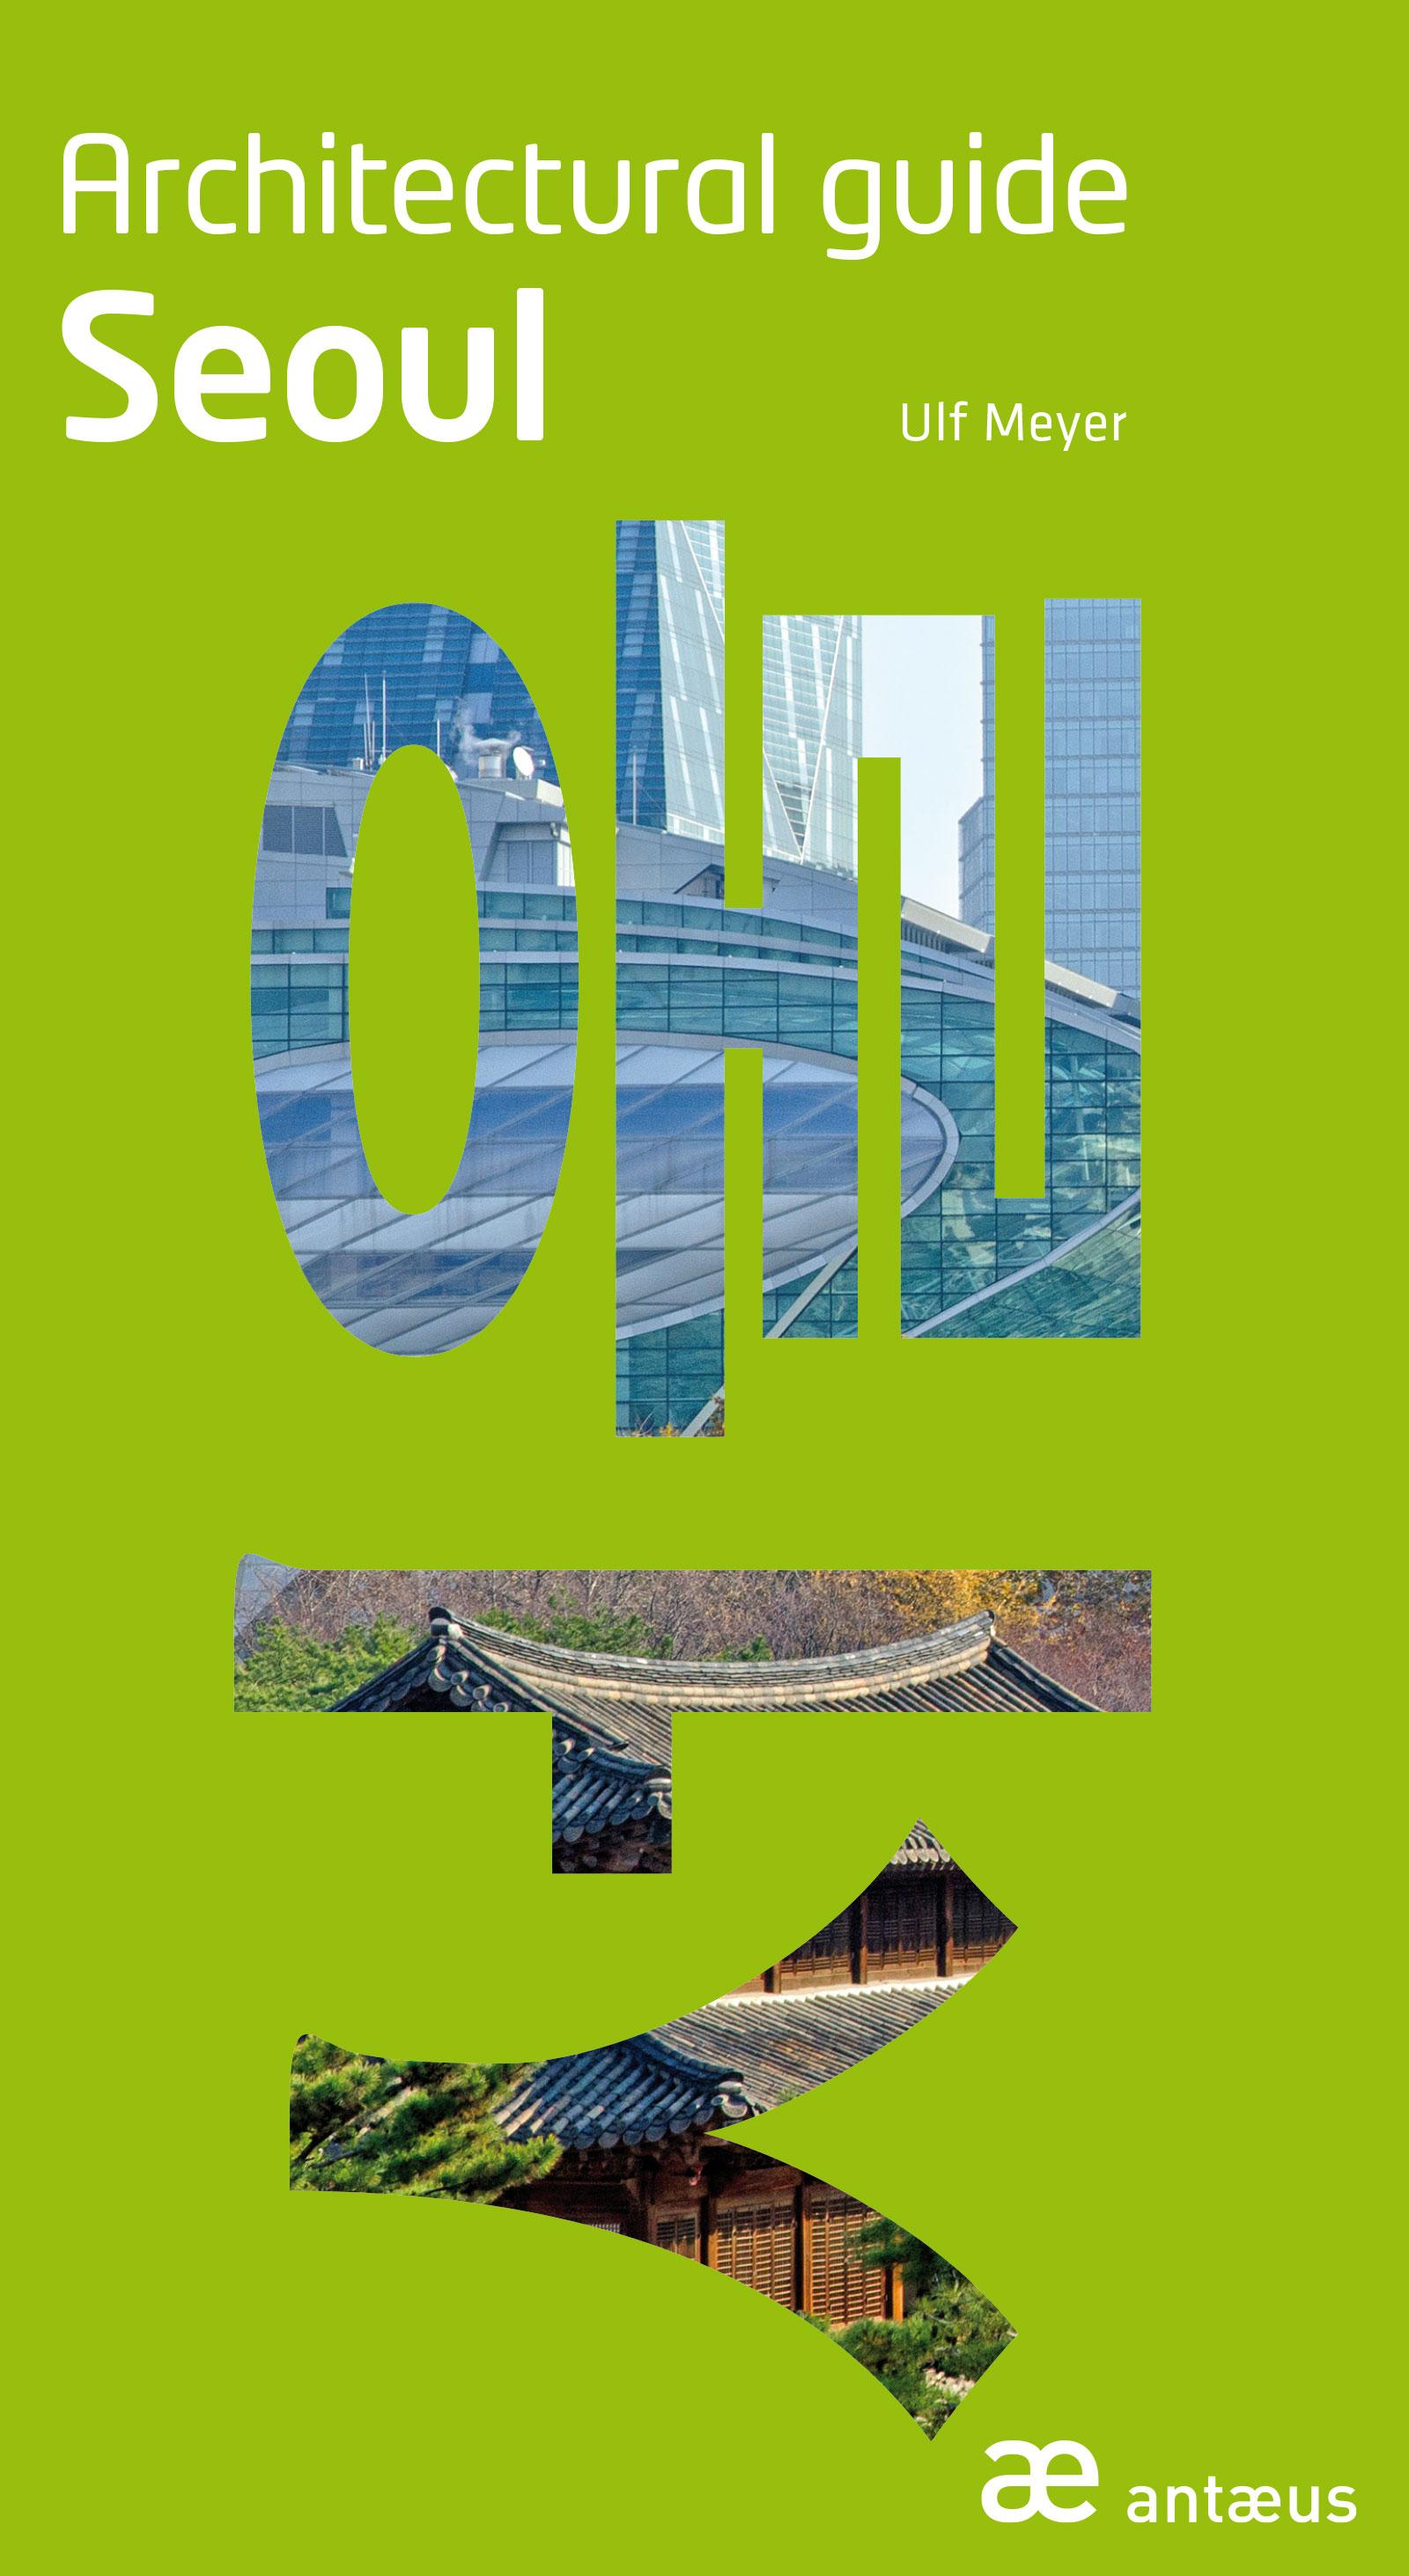 Titel des »Architectural Guide Seoul«